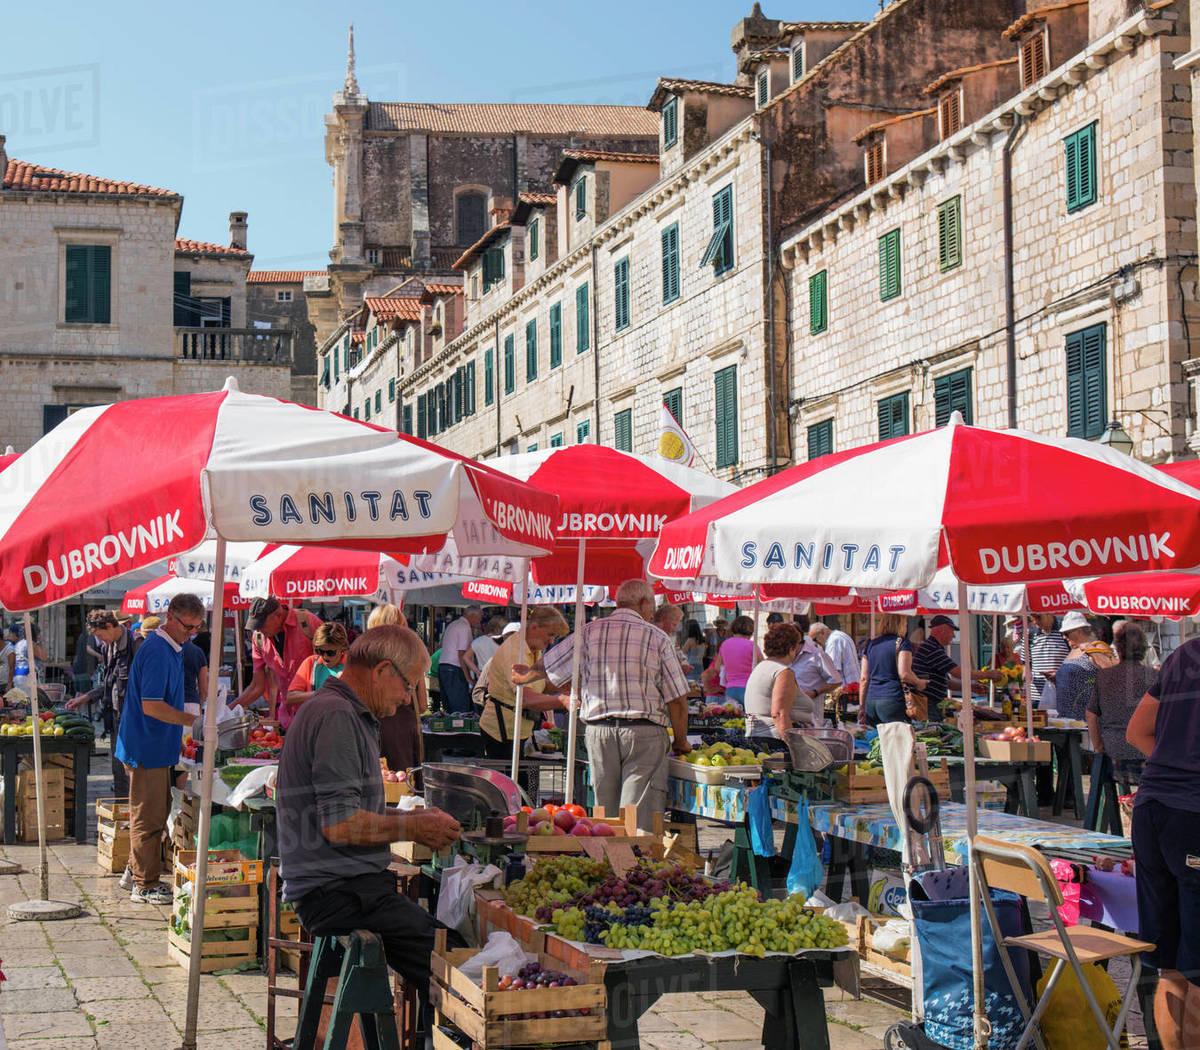 Colourful fruit and vegetable market in Gundulic Square, Gunduliceva Poljana, Dubrovnik, Dubrovnik-Neretva, Dalmatia, Croatia, Europe Royalty-free stock photo